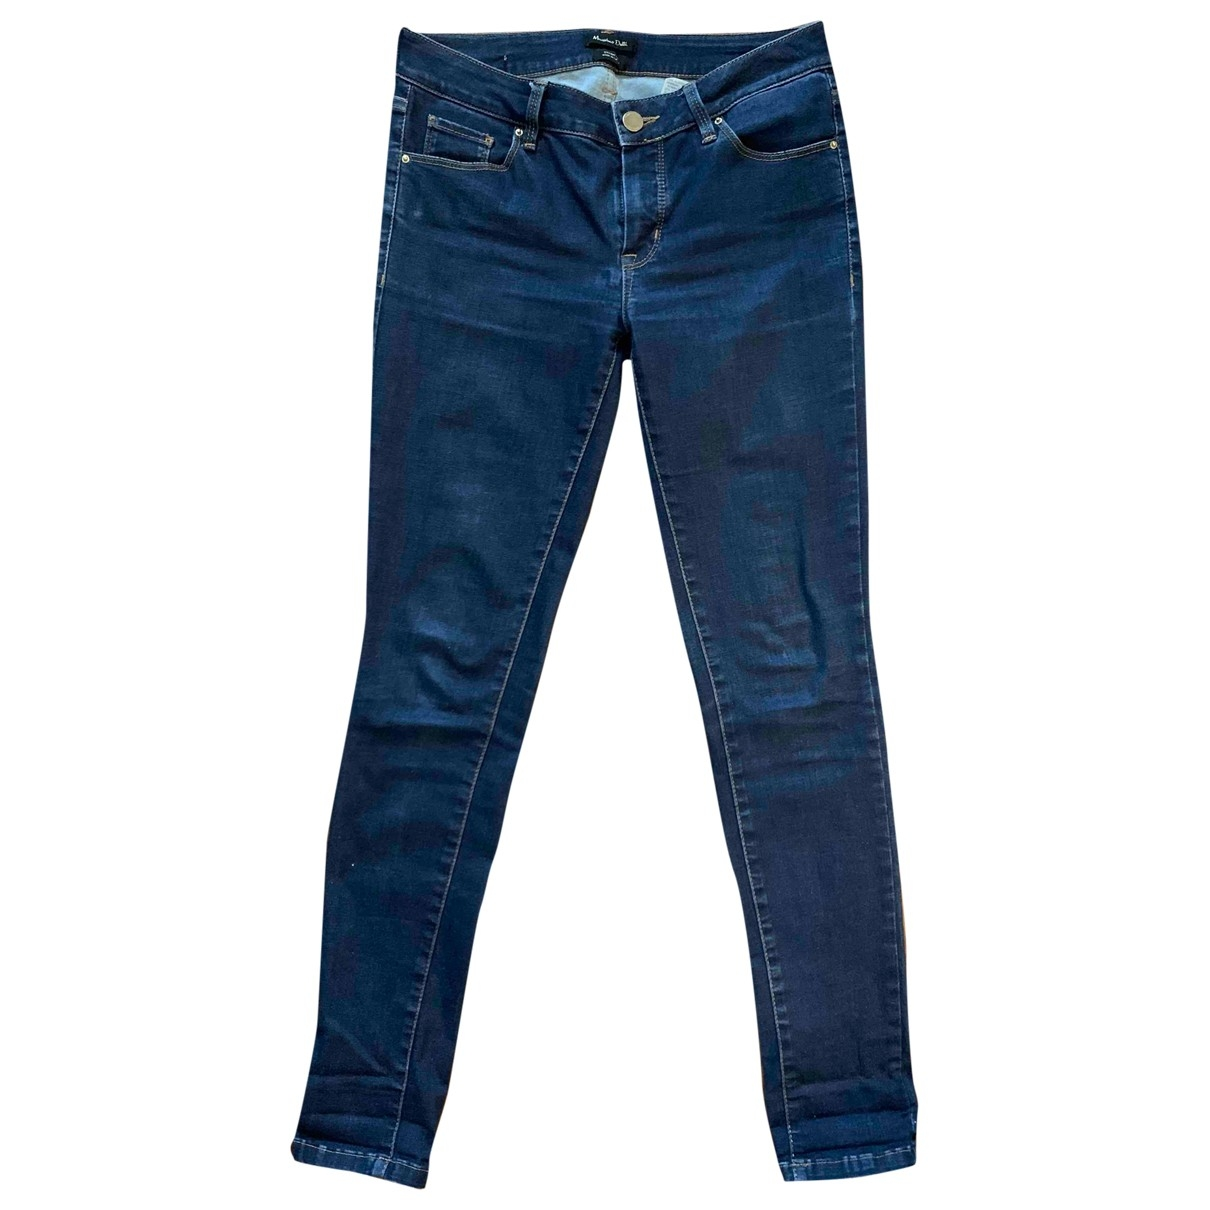 Massimo Dutti \N Blue Cotton - elasthane Jeans for Women 36 FR